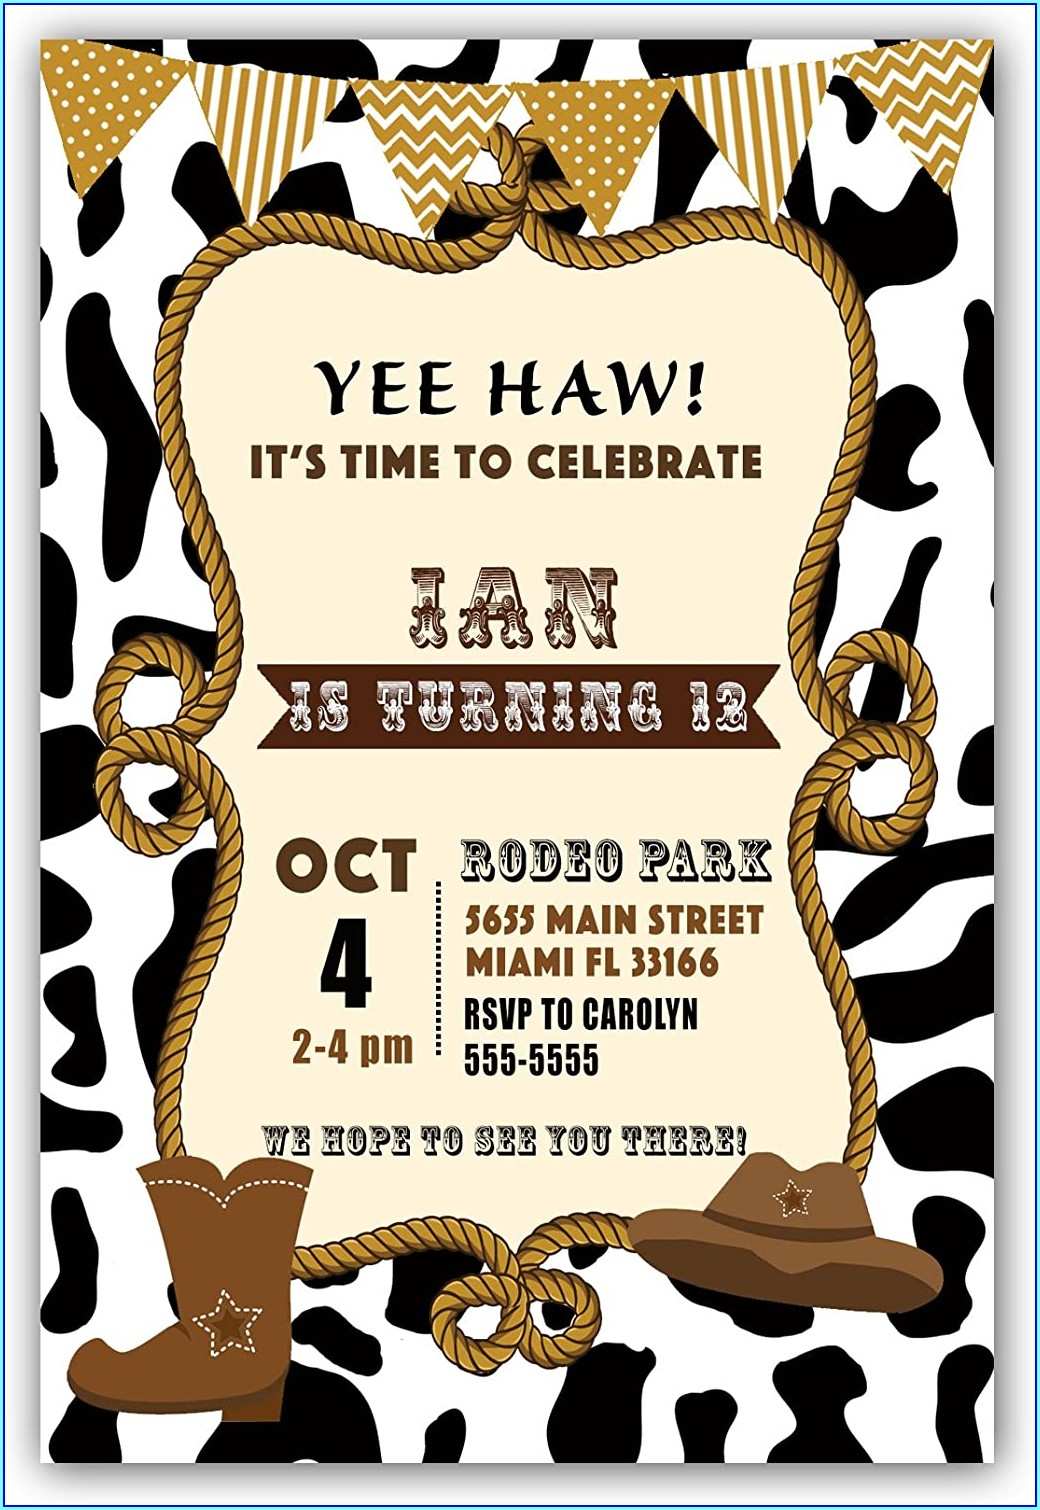 Customizable Blank Cowboy Invitation Template